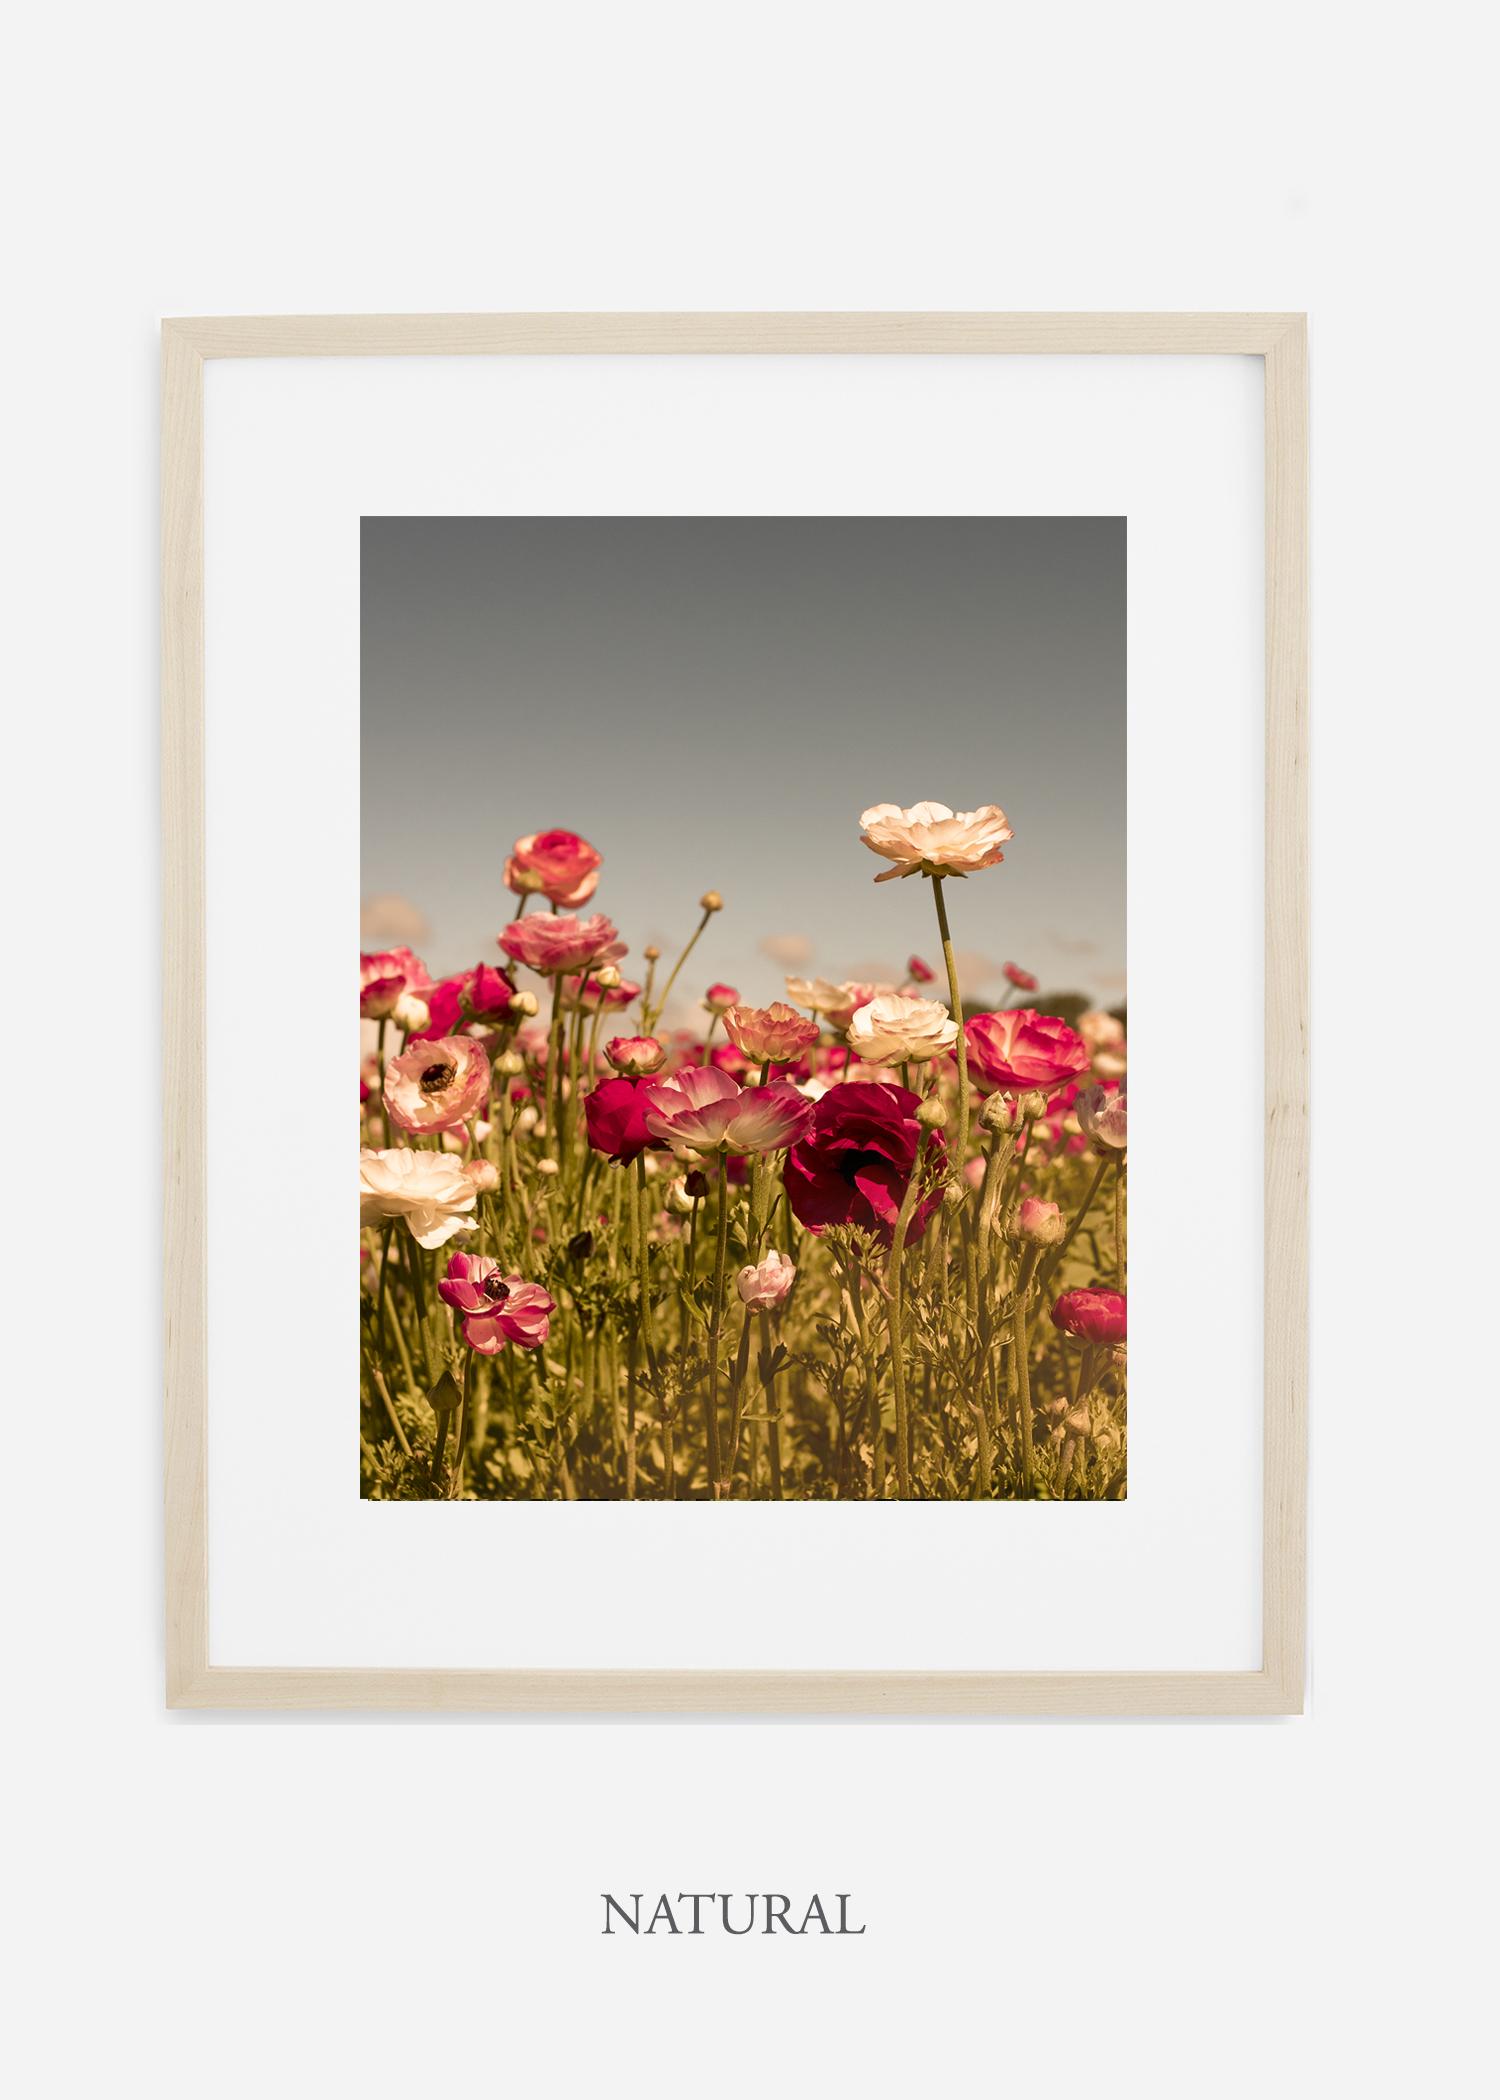 wilder-california-Floral-No.3-natural-wood-frame-mat-interior-design-botanical-print-art-floral-art.jpg